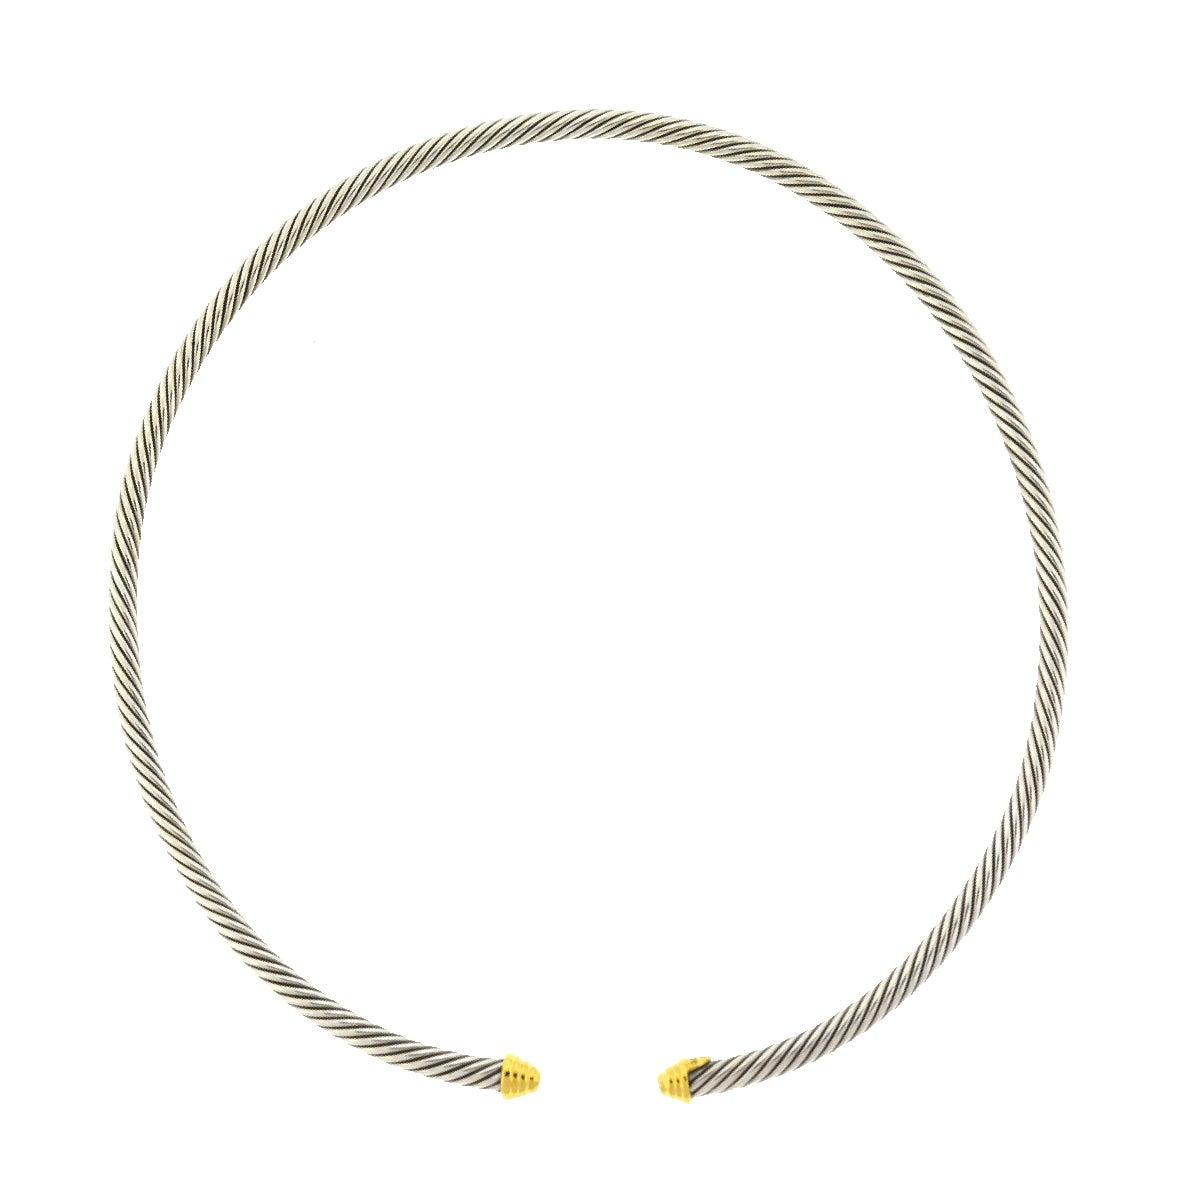 David Yurman 18 Karat Yellow Gold Stainless Steel Classic Collar Necklace